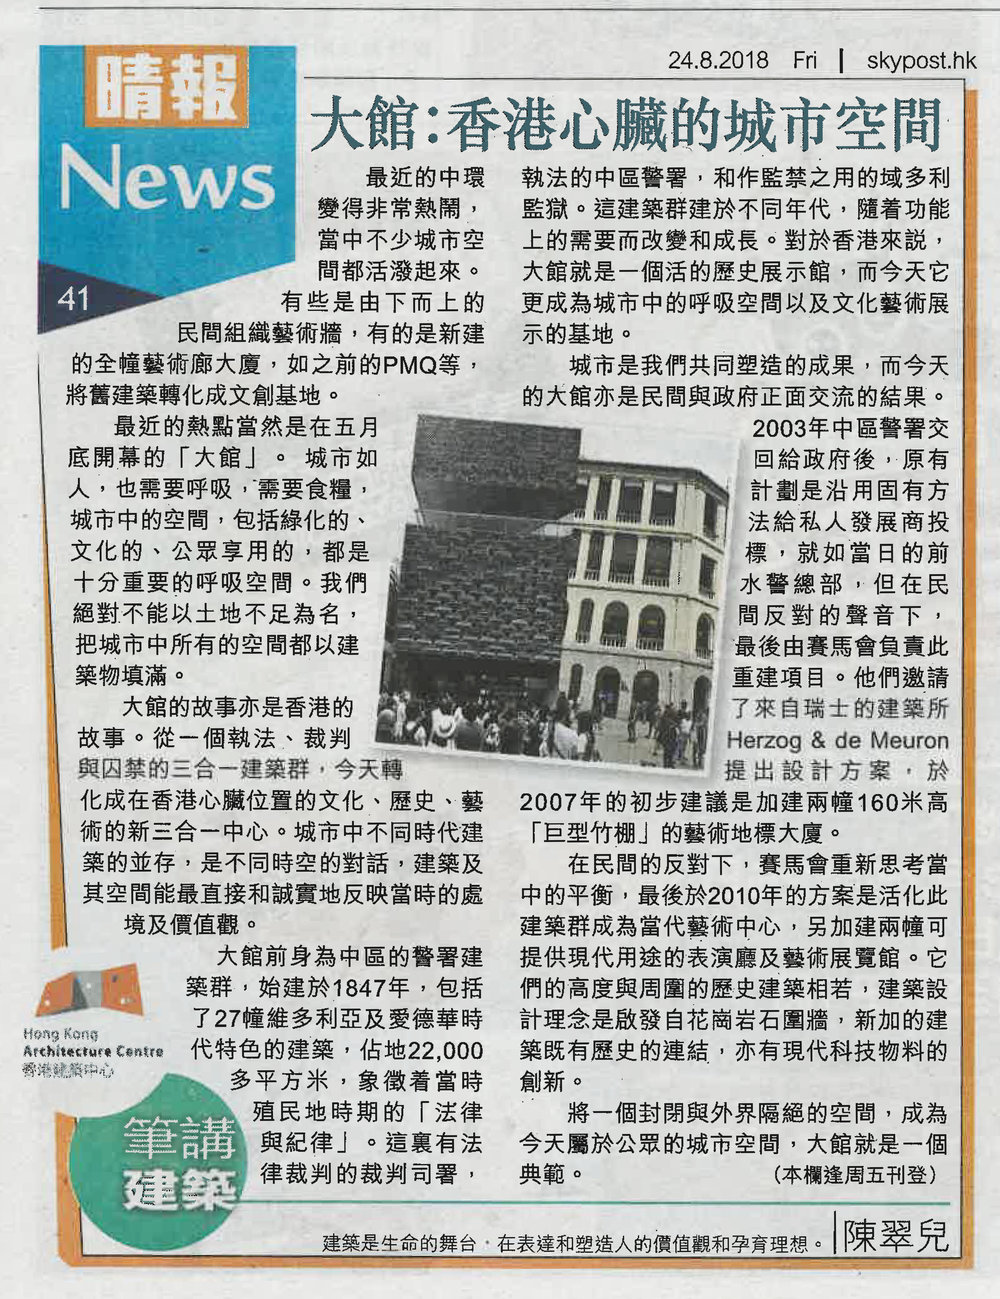 Skypost_180824_陳翠兒_大館︰香港心臟的城市空間_Resise.jpg